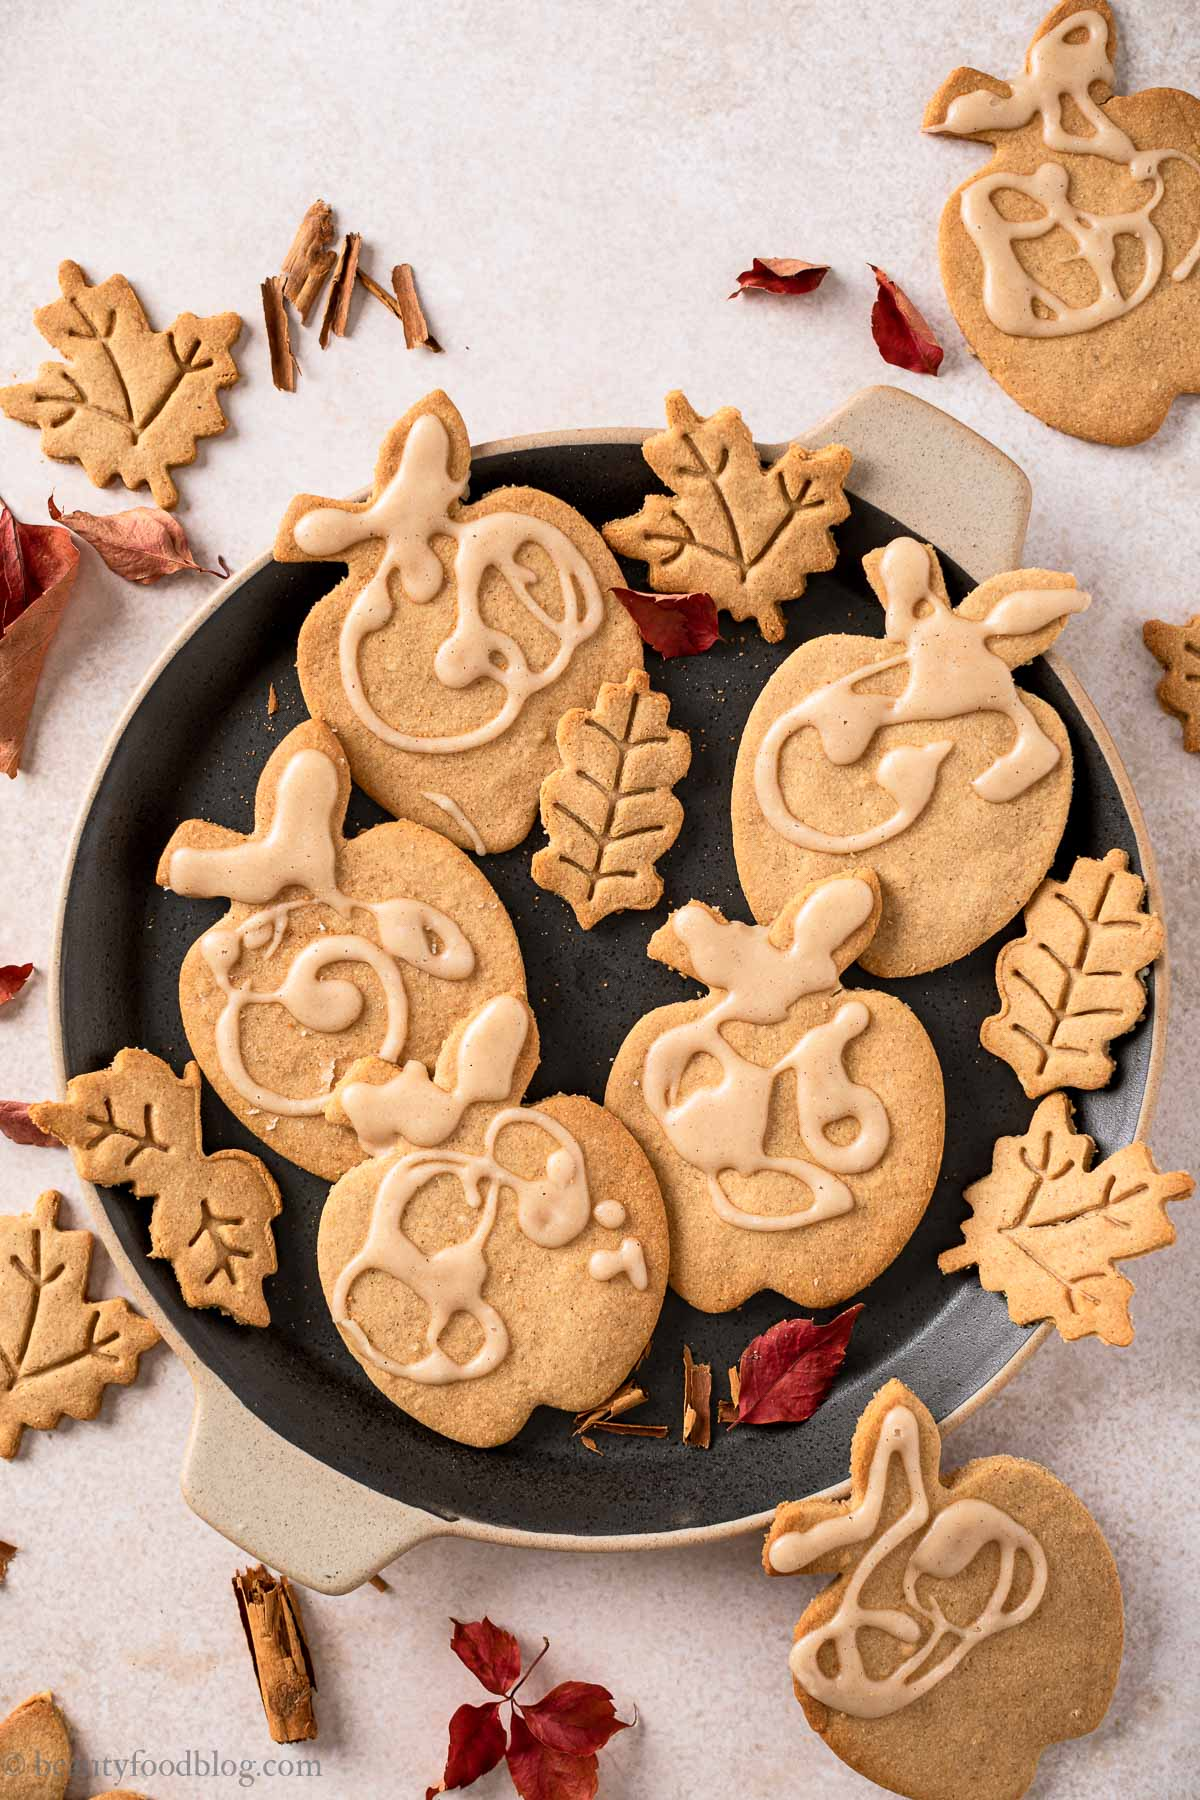 gluten-free vegan maple cookies with applesauce shortbread cookies recipe ricetta Biscotti Autunnali Senza Burro Senza Glutine vegan alle mele e sciroppo d'acero